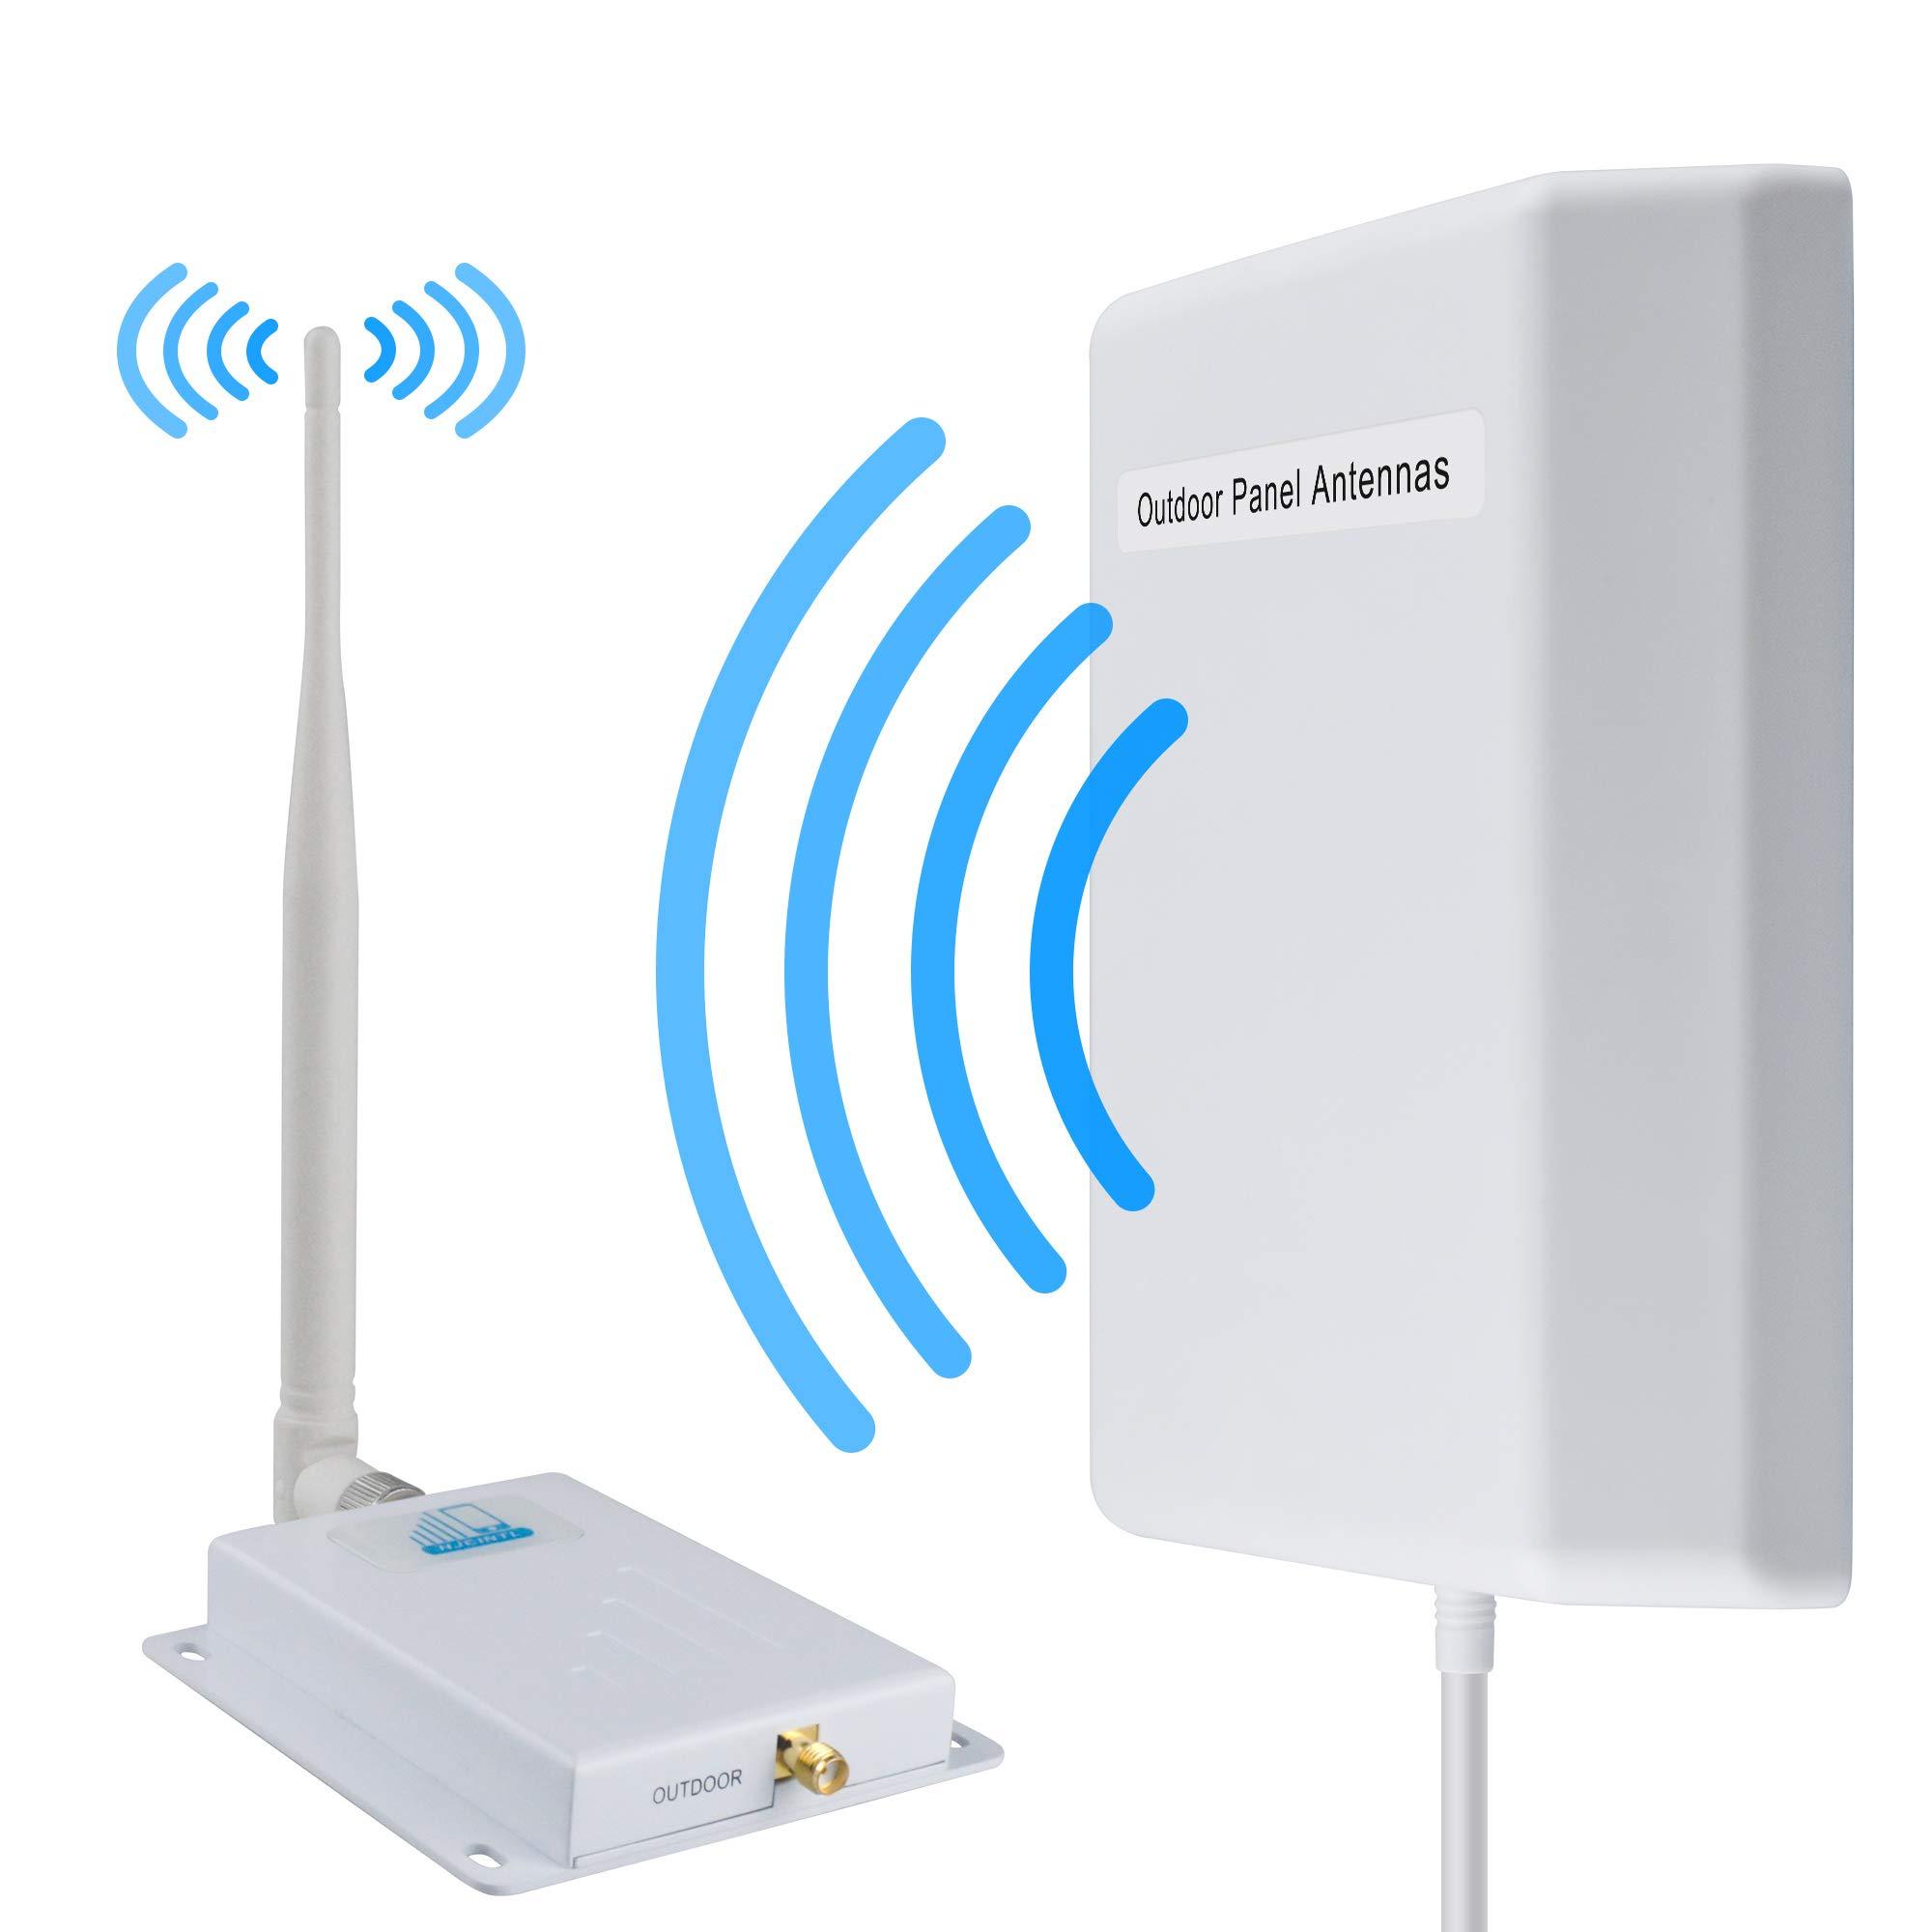 27003ffb7d2 Signal Boosters ATT 4G LTE Cell Phone Signal Boosters HJCINTL FDD Band  12 17 700Mhz